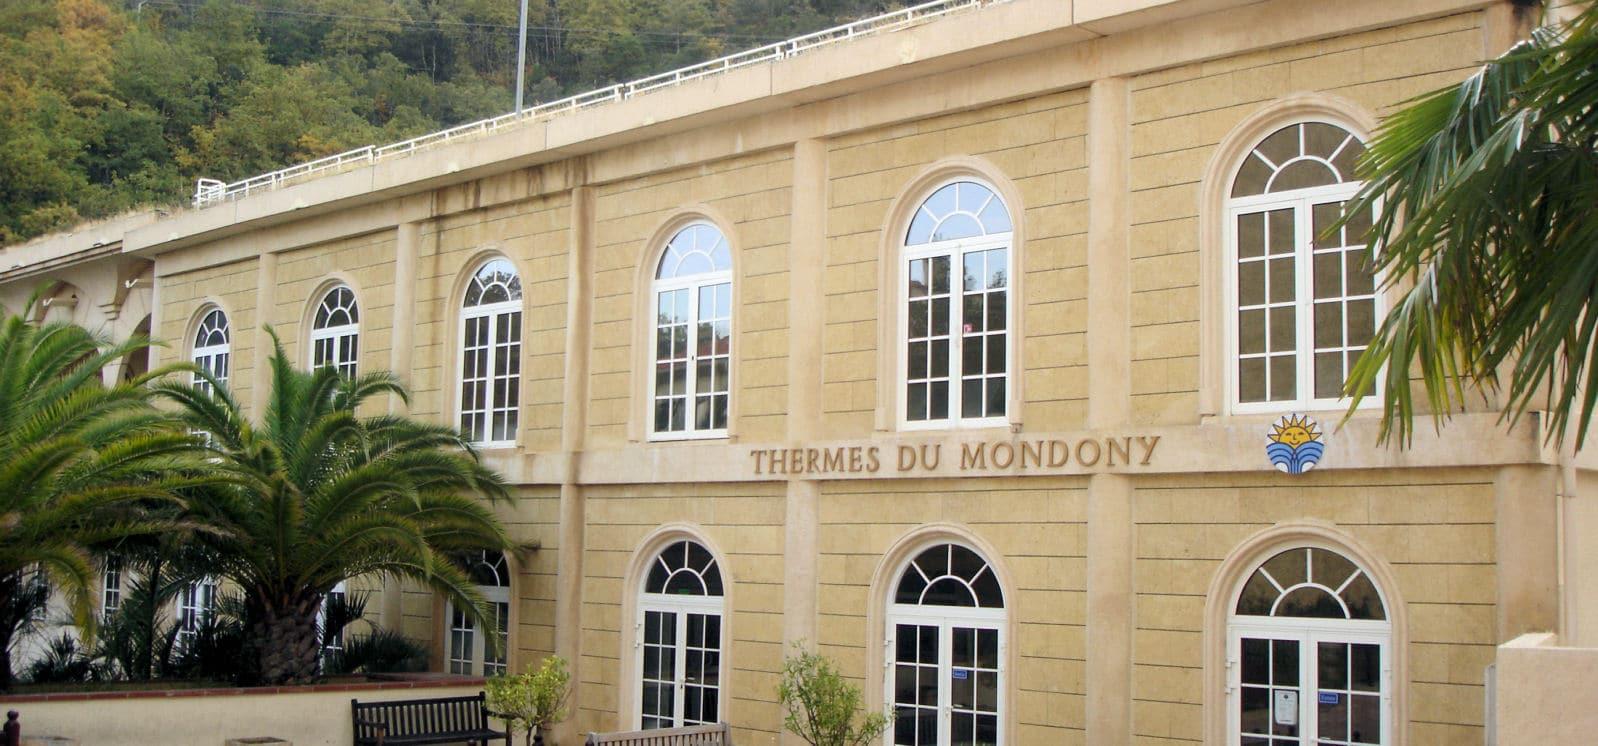 Thermes du mondony - Amélie les Bains